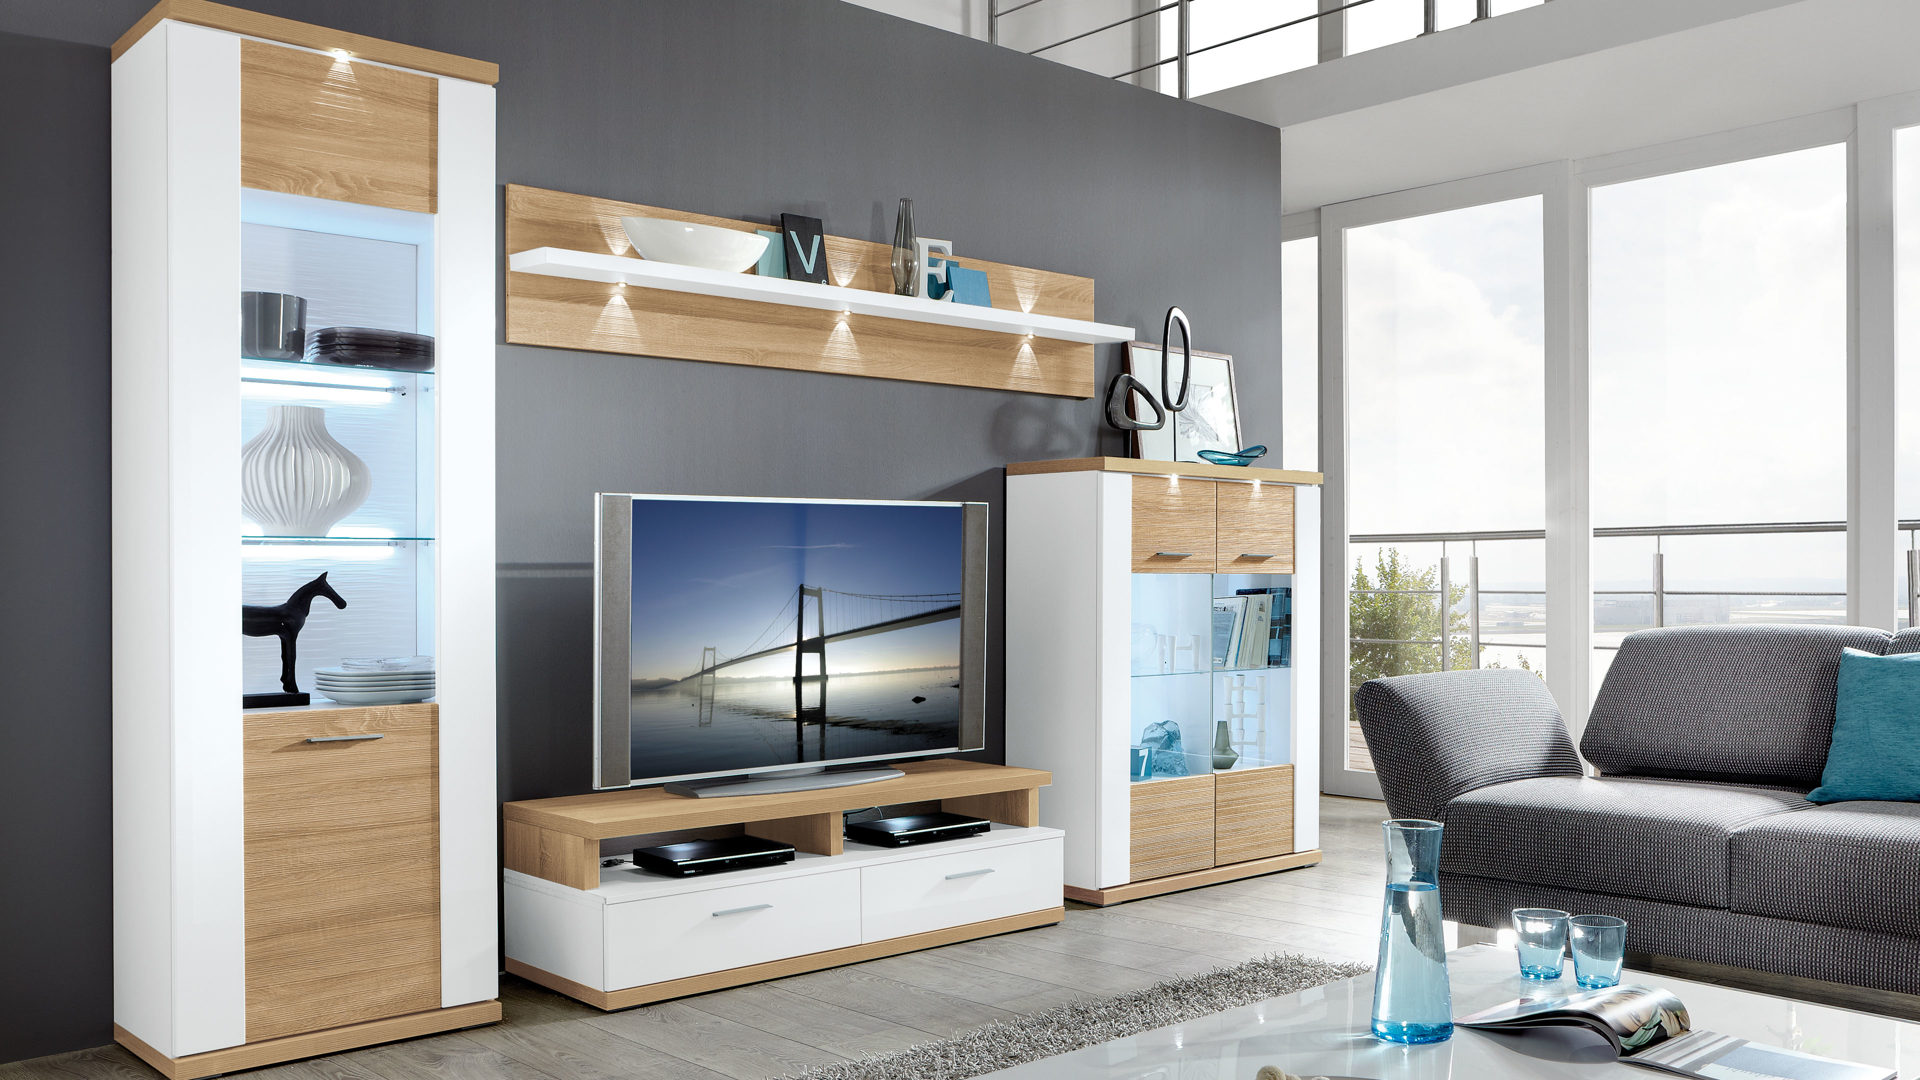 Wohnkombination Wohnwand Mit Tv Mobel Arcticweisse